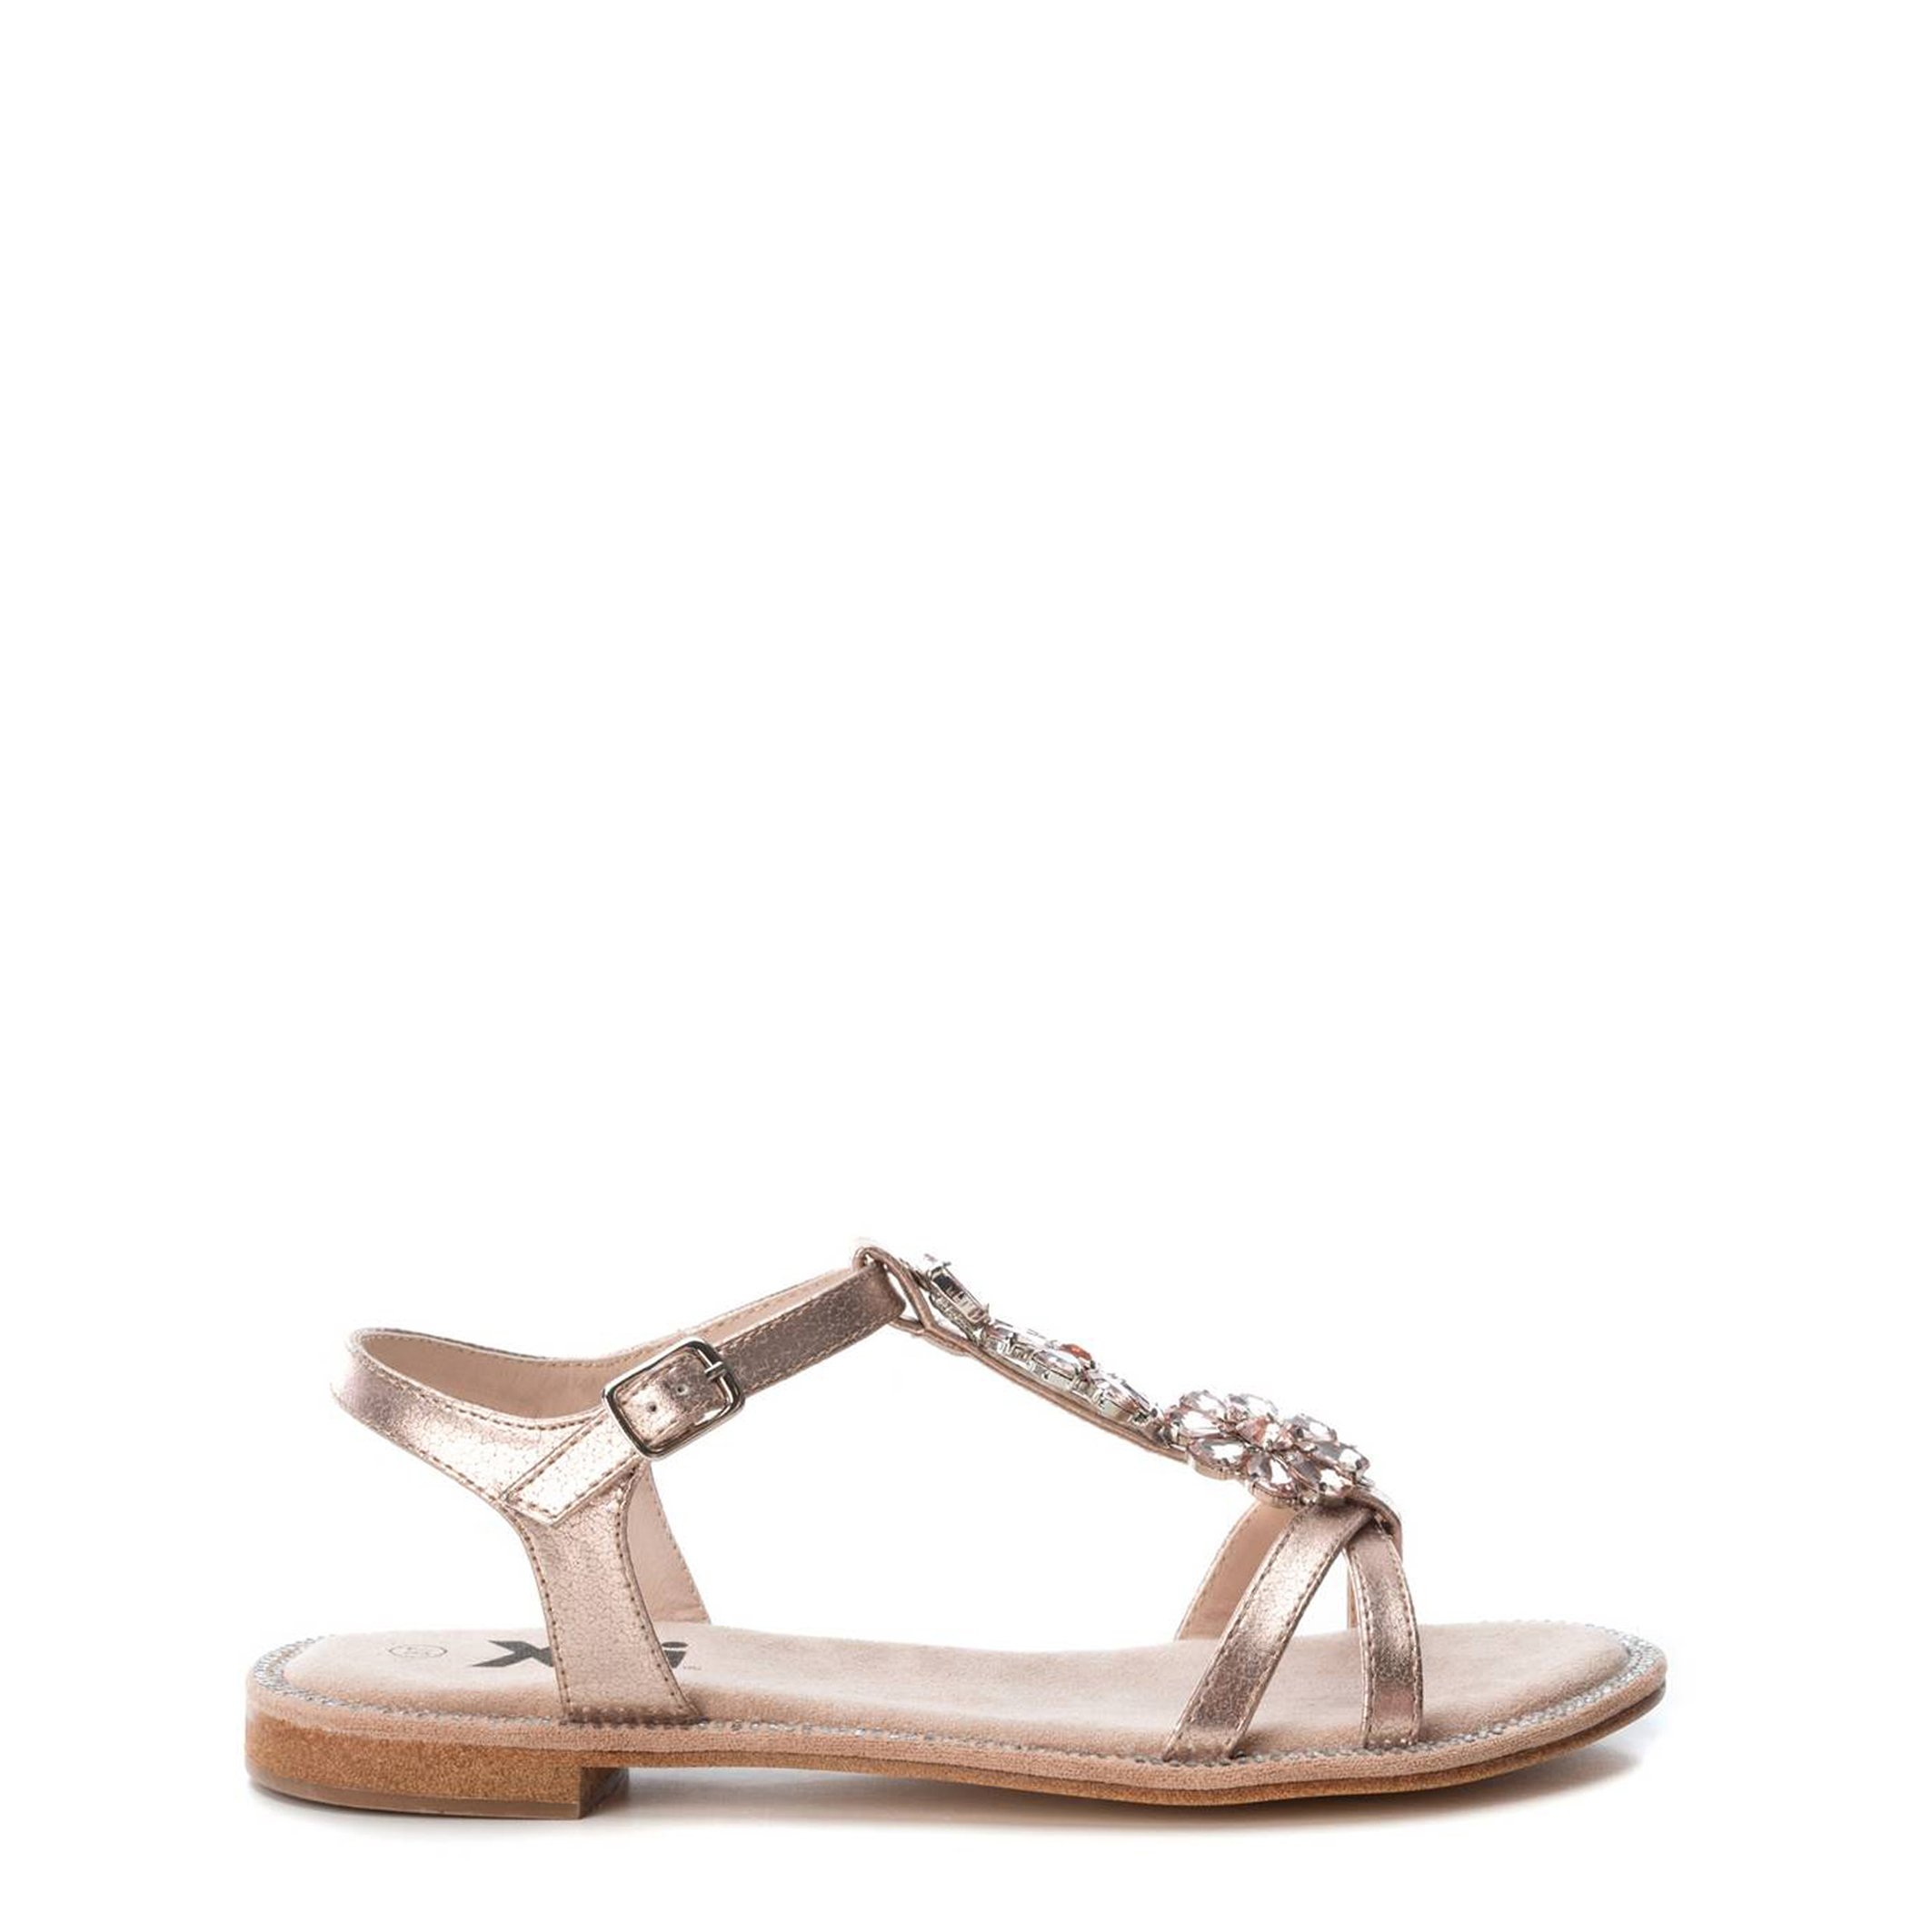 Xti Women's Sandals Various Colors 48995 - pink 36 EU